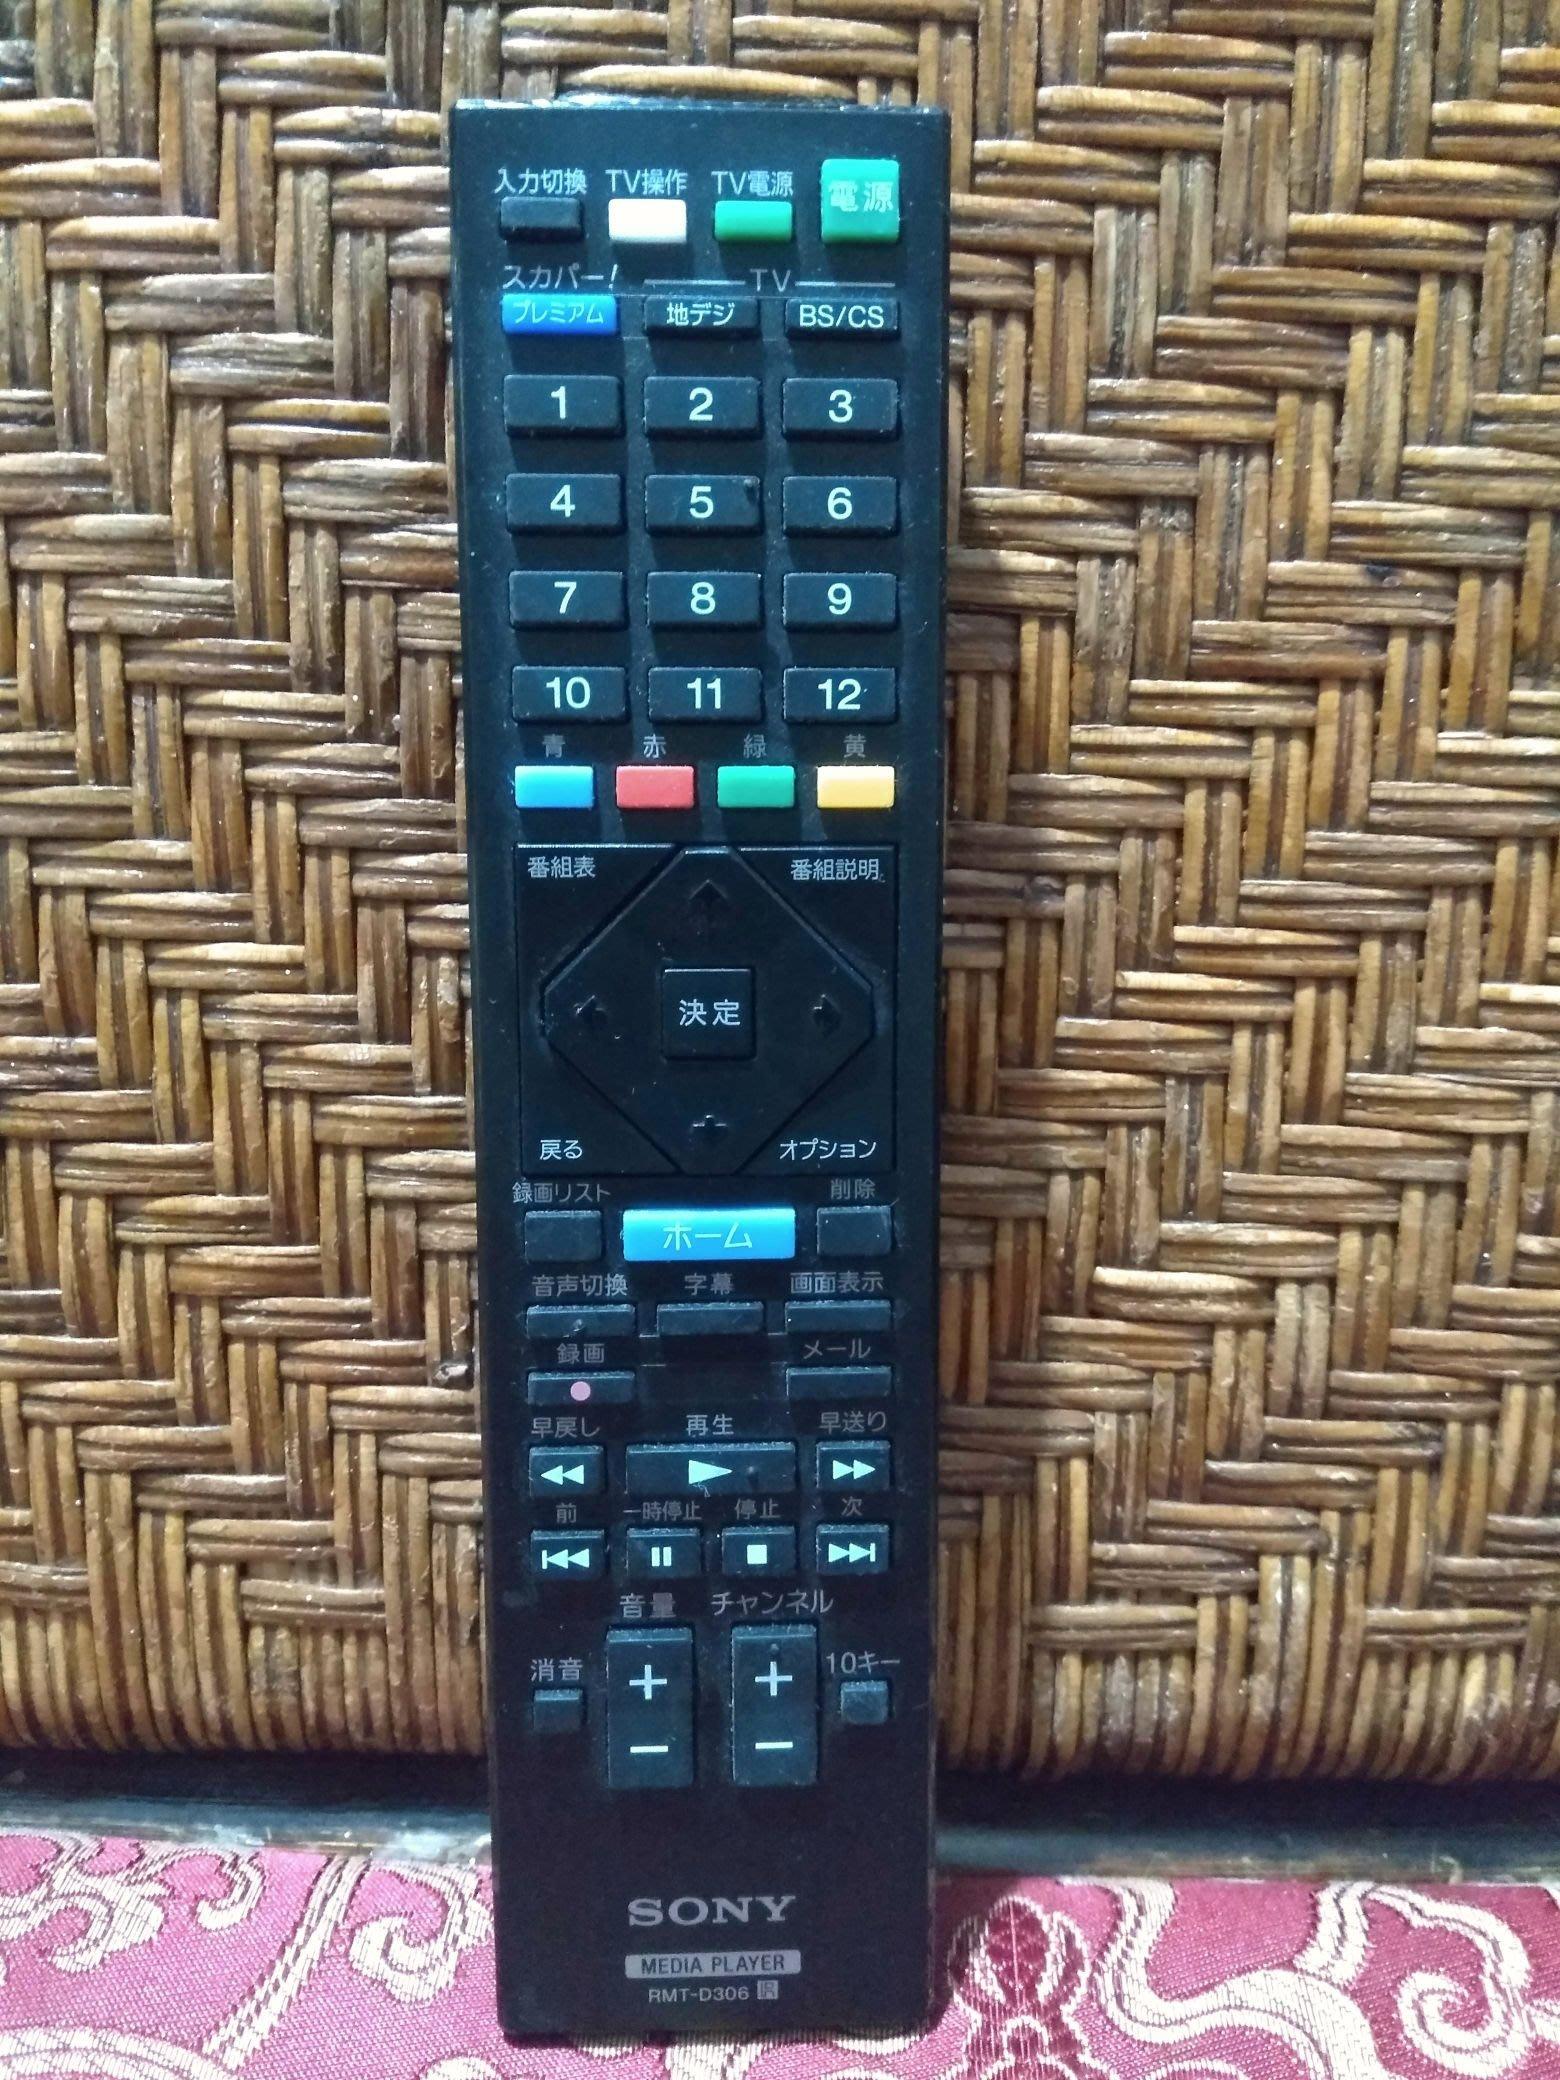 SONY 多媒體播放機專用遙控器RMT-D306